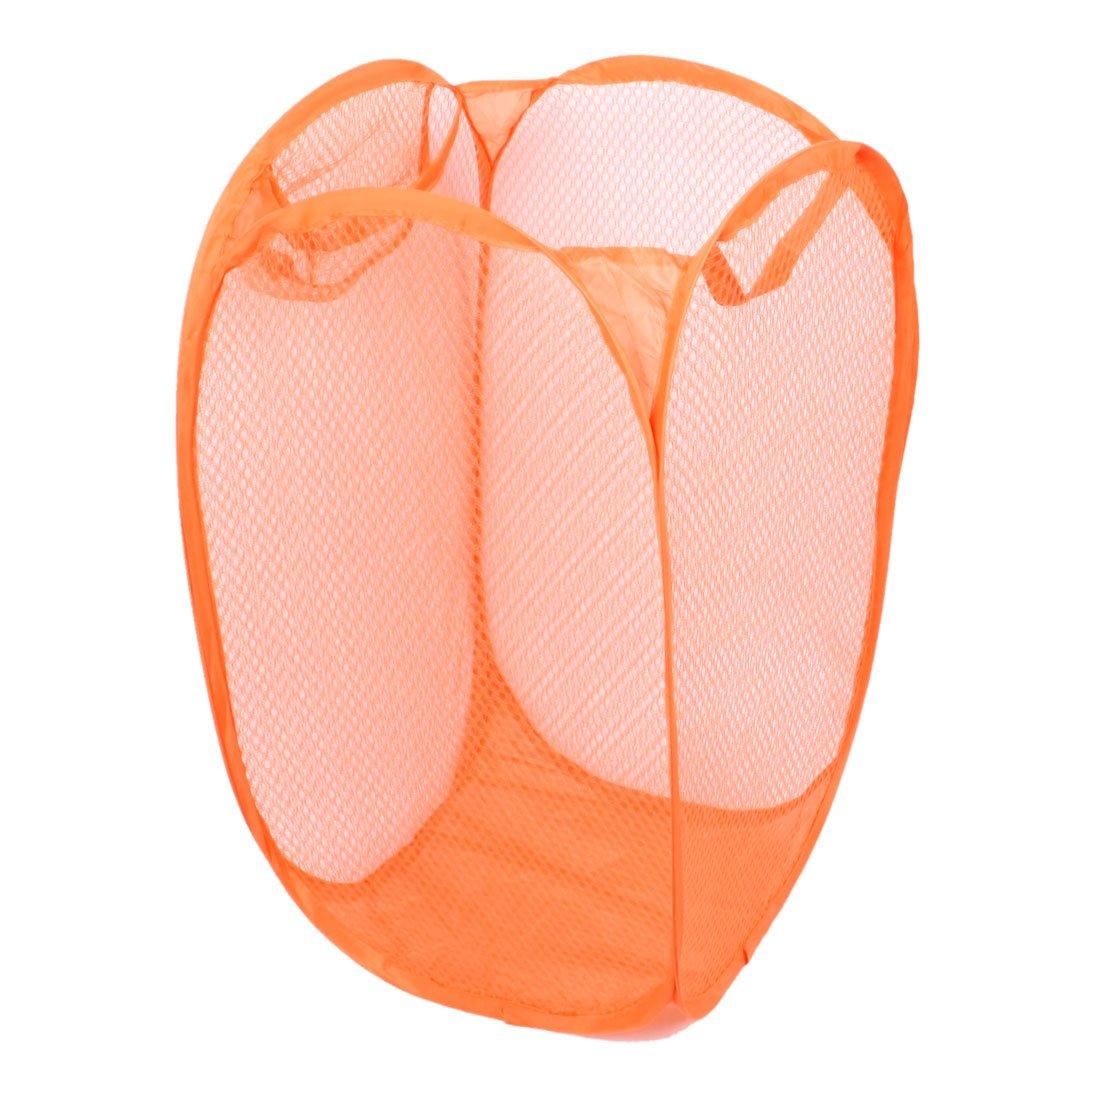 Household Dirty Clothes Laundry Folding Mesh Bag Basket Holder Orange